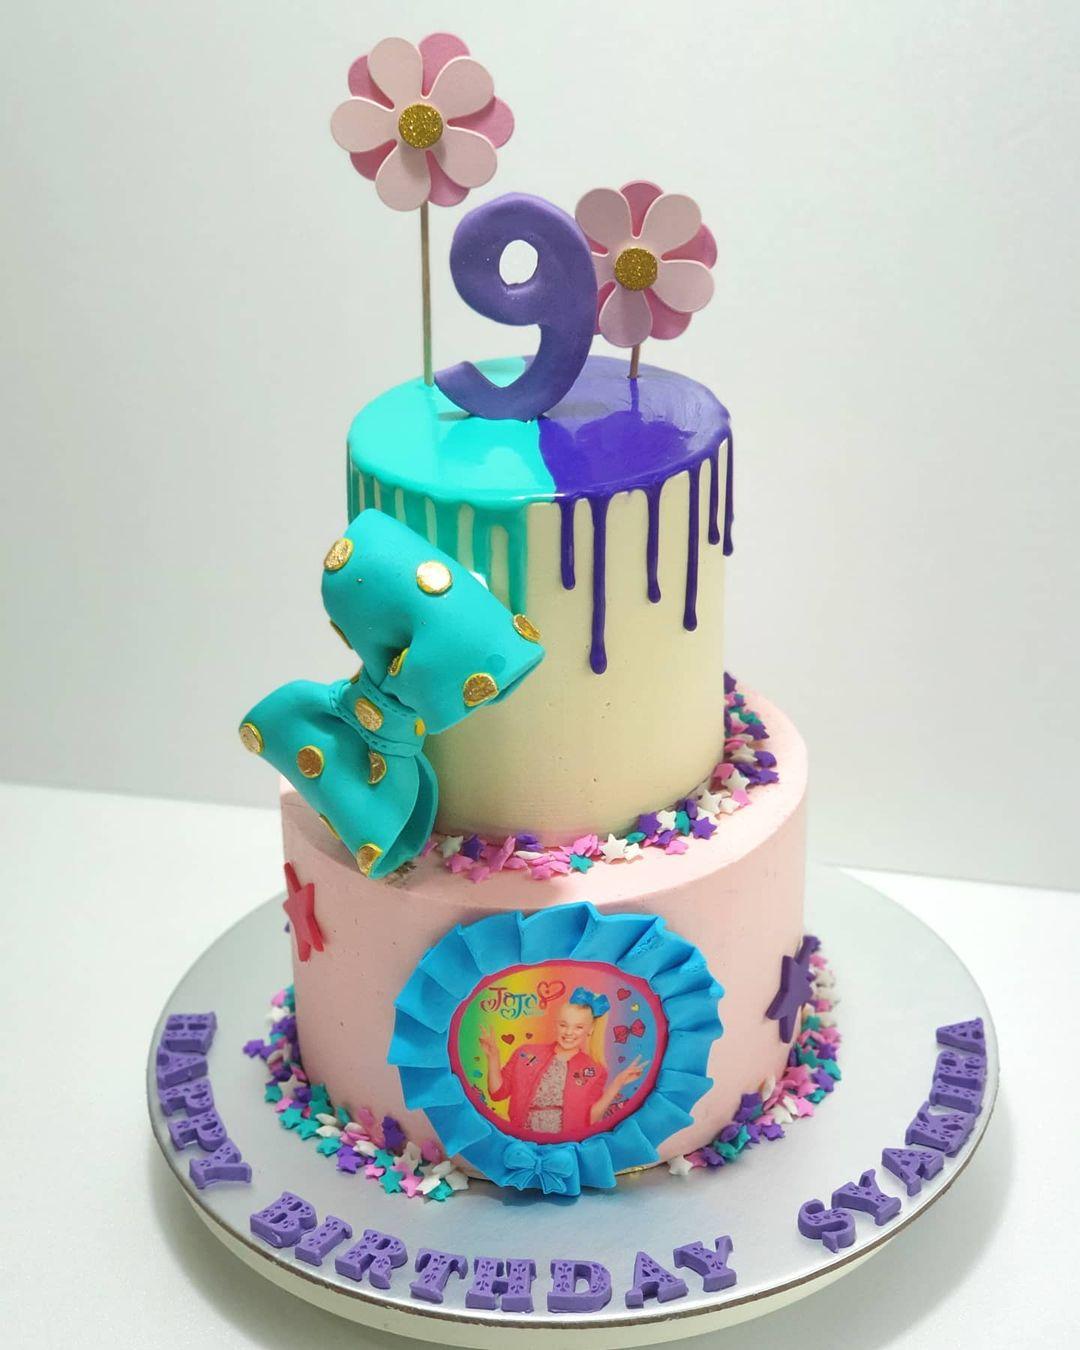 birthday cakes singapore - sooperlicious